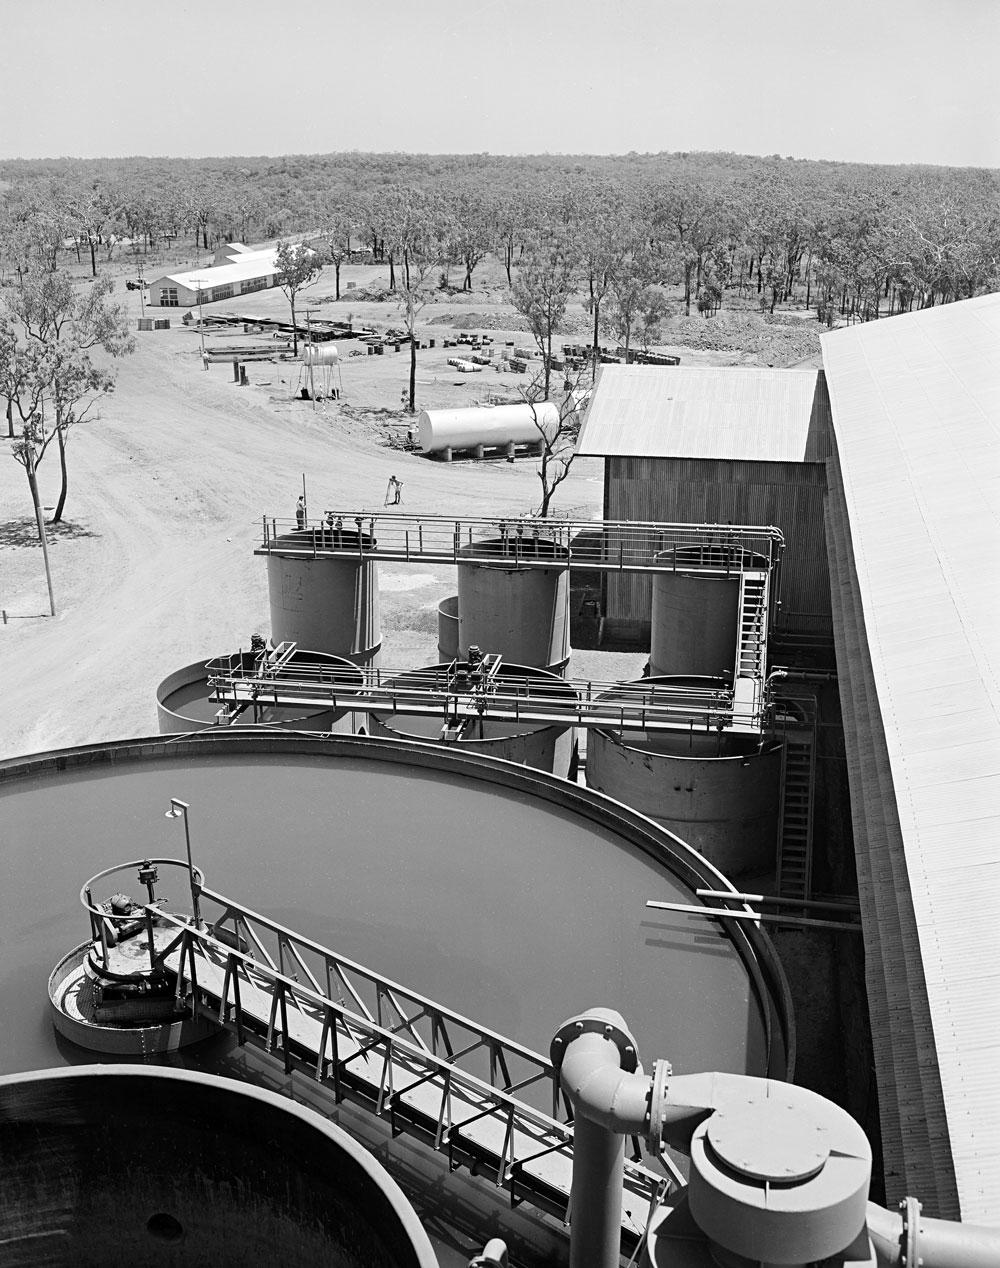 Treatment plant, Rum Jungle (1957). National Archives of Australia: A1200, L23831